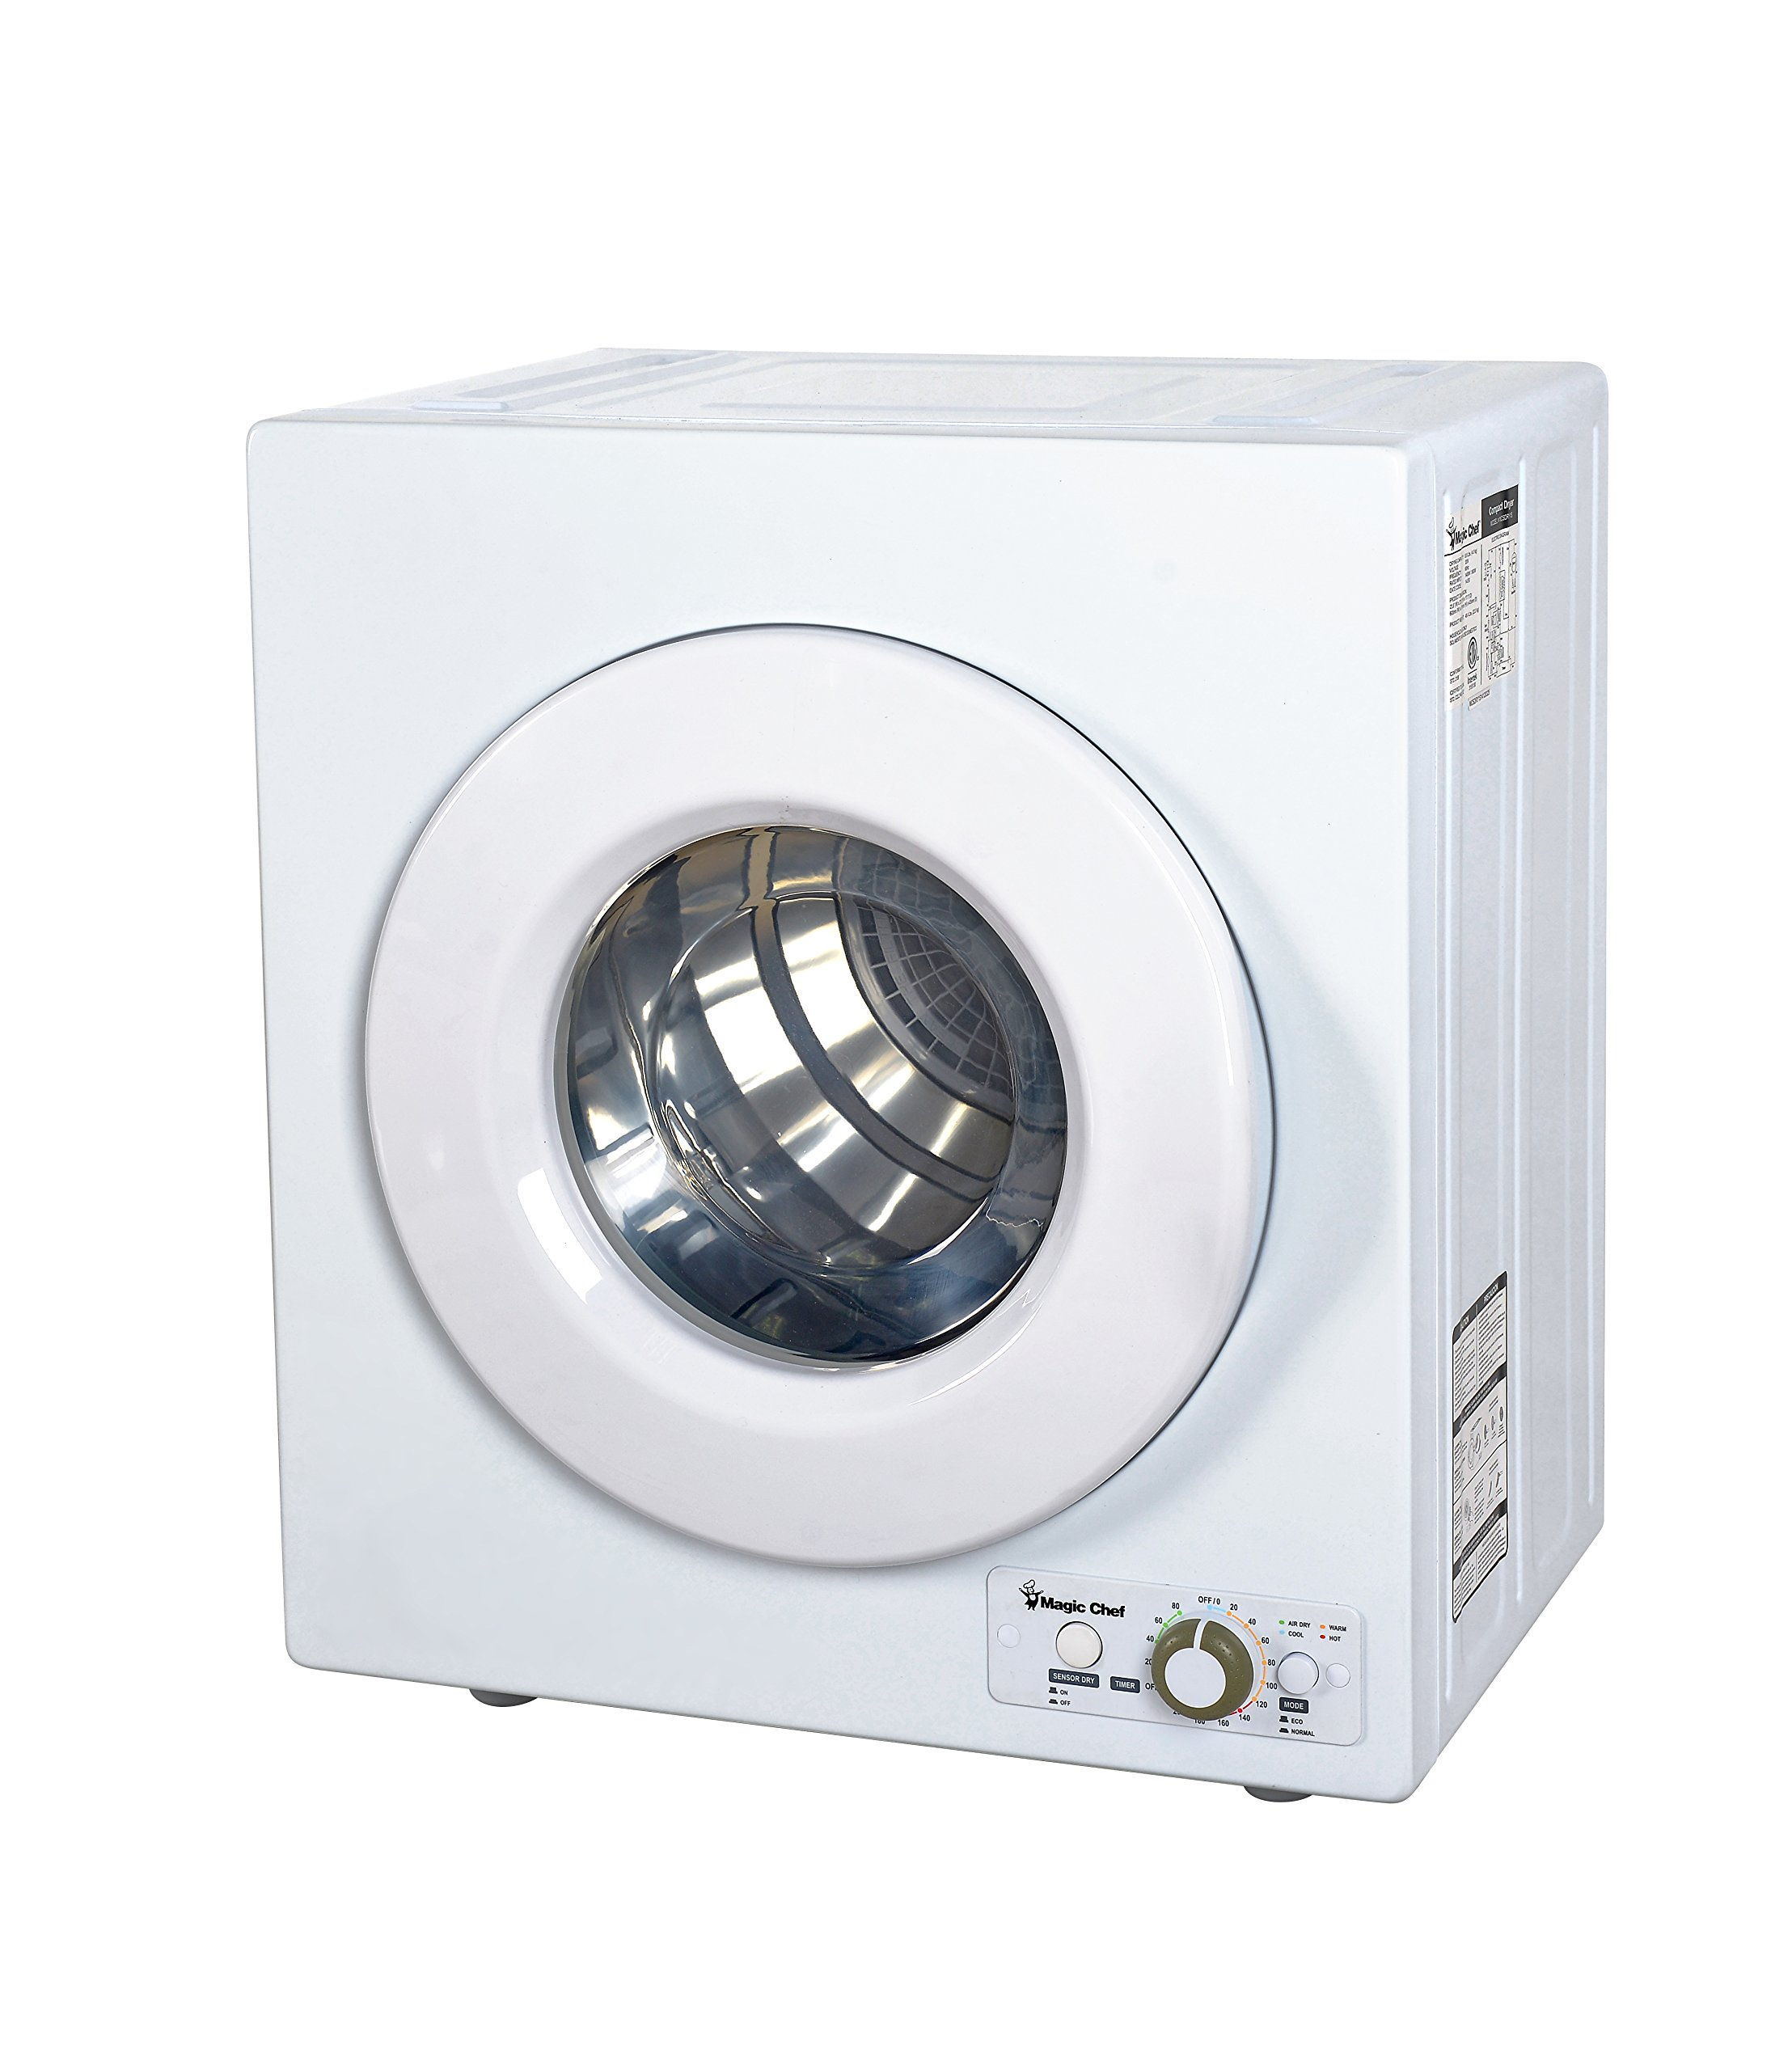 Magic Chef MCSDRY1S 2.6 cu. ft. Laundry Dryer, White by Magic Chef